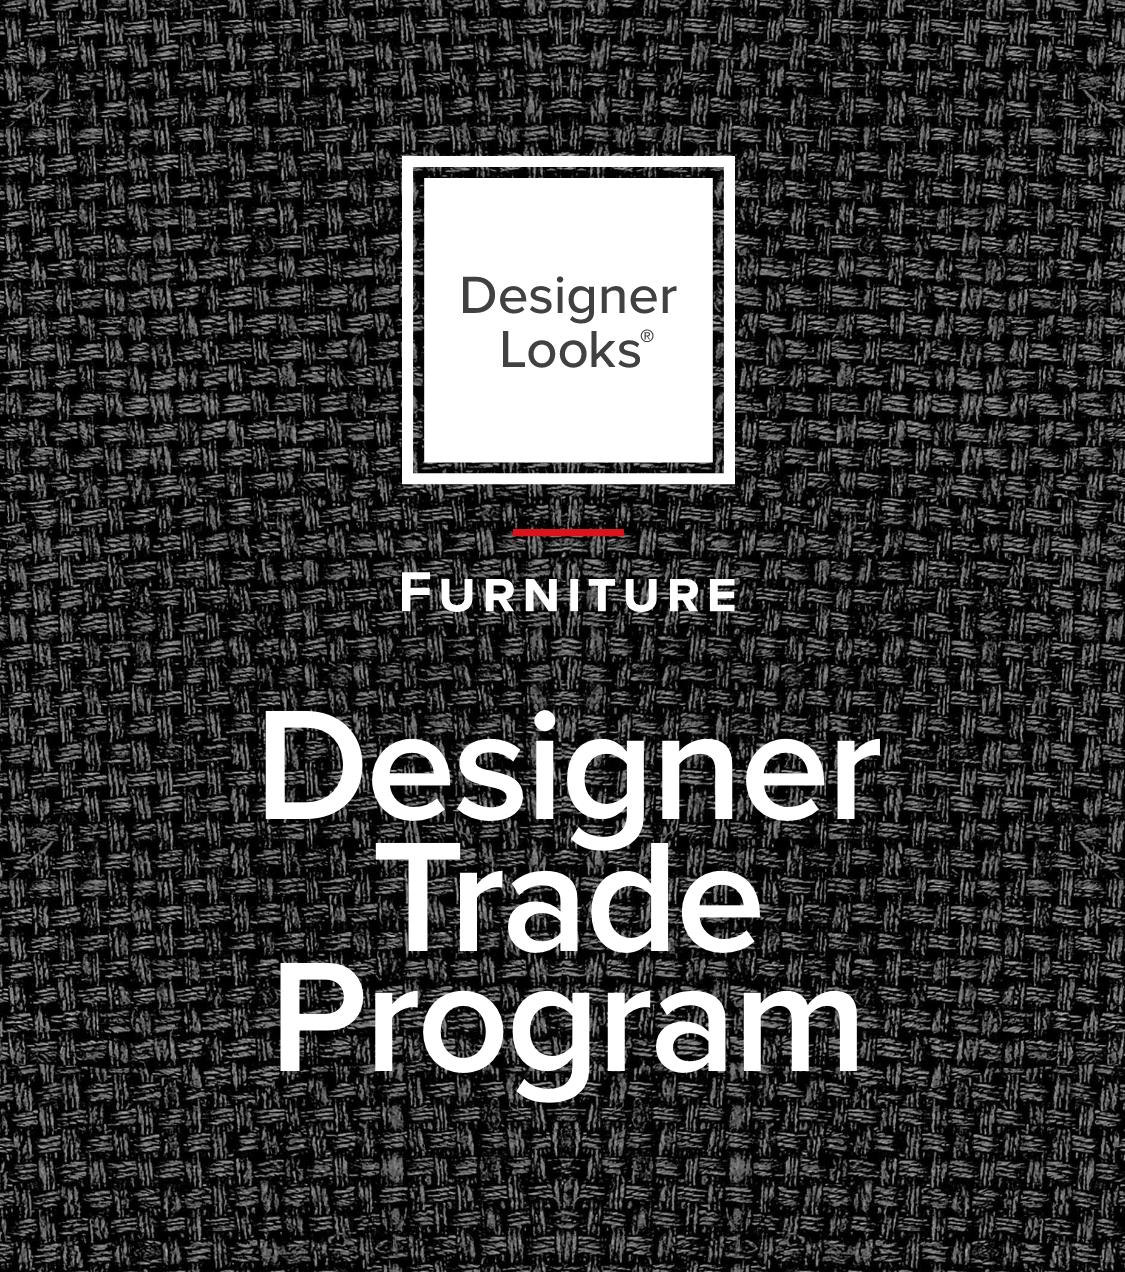 Designer Looks | Furniture | Designer Trade Program